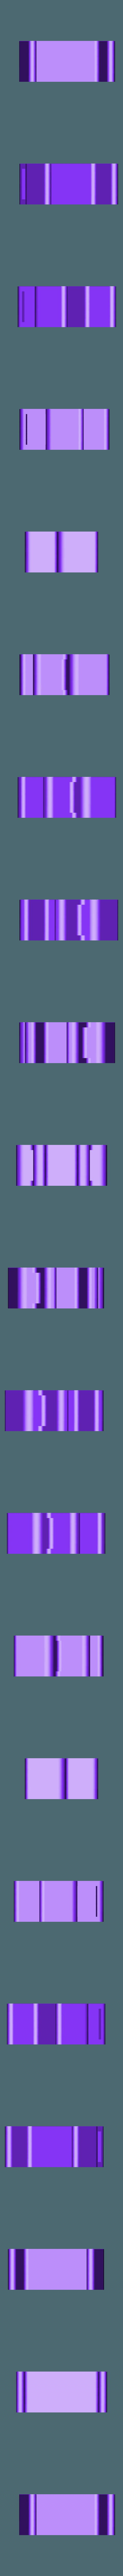 body_18mm.stl Download free STL file Shelf brackets for ivy • 3D printing template, kumekay